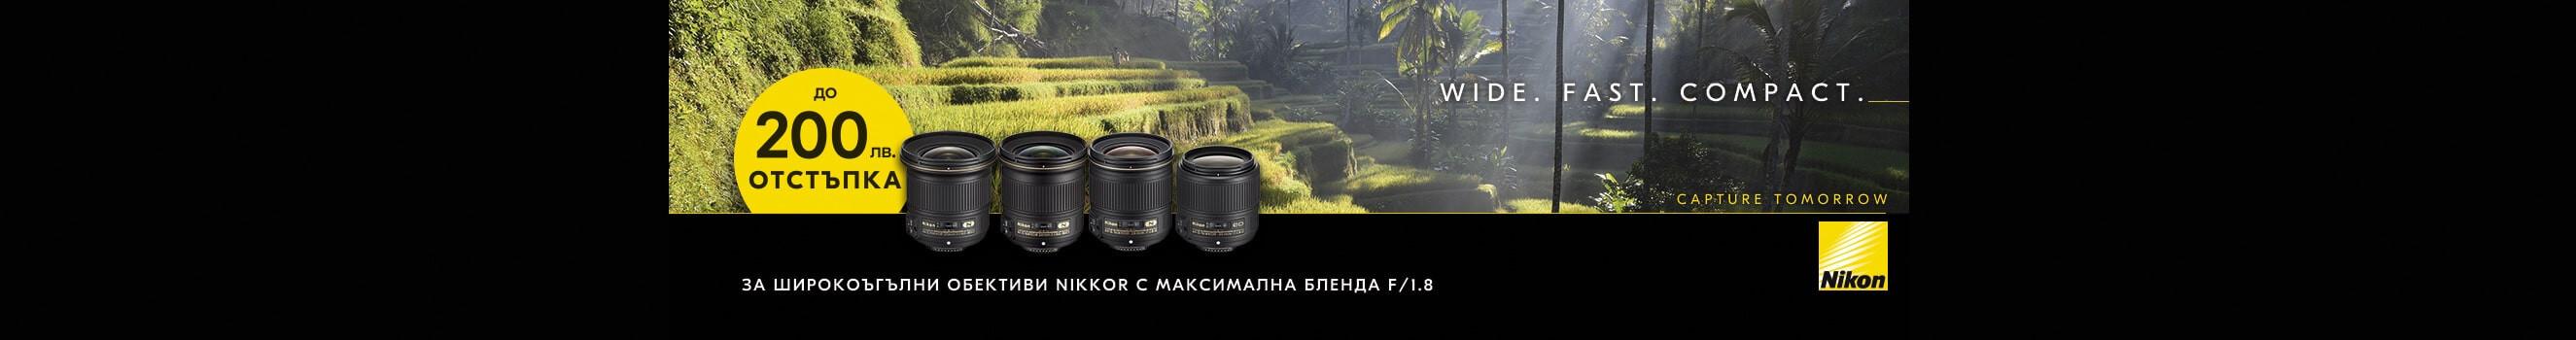 До 200 лв. отстъпка за избрани обективи Nikon